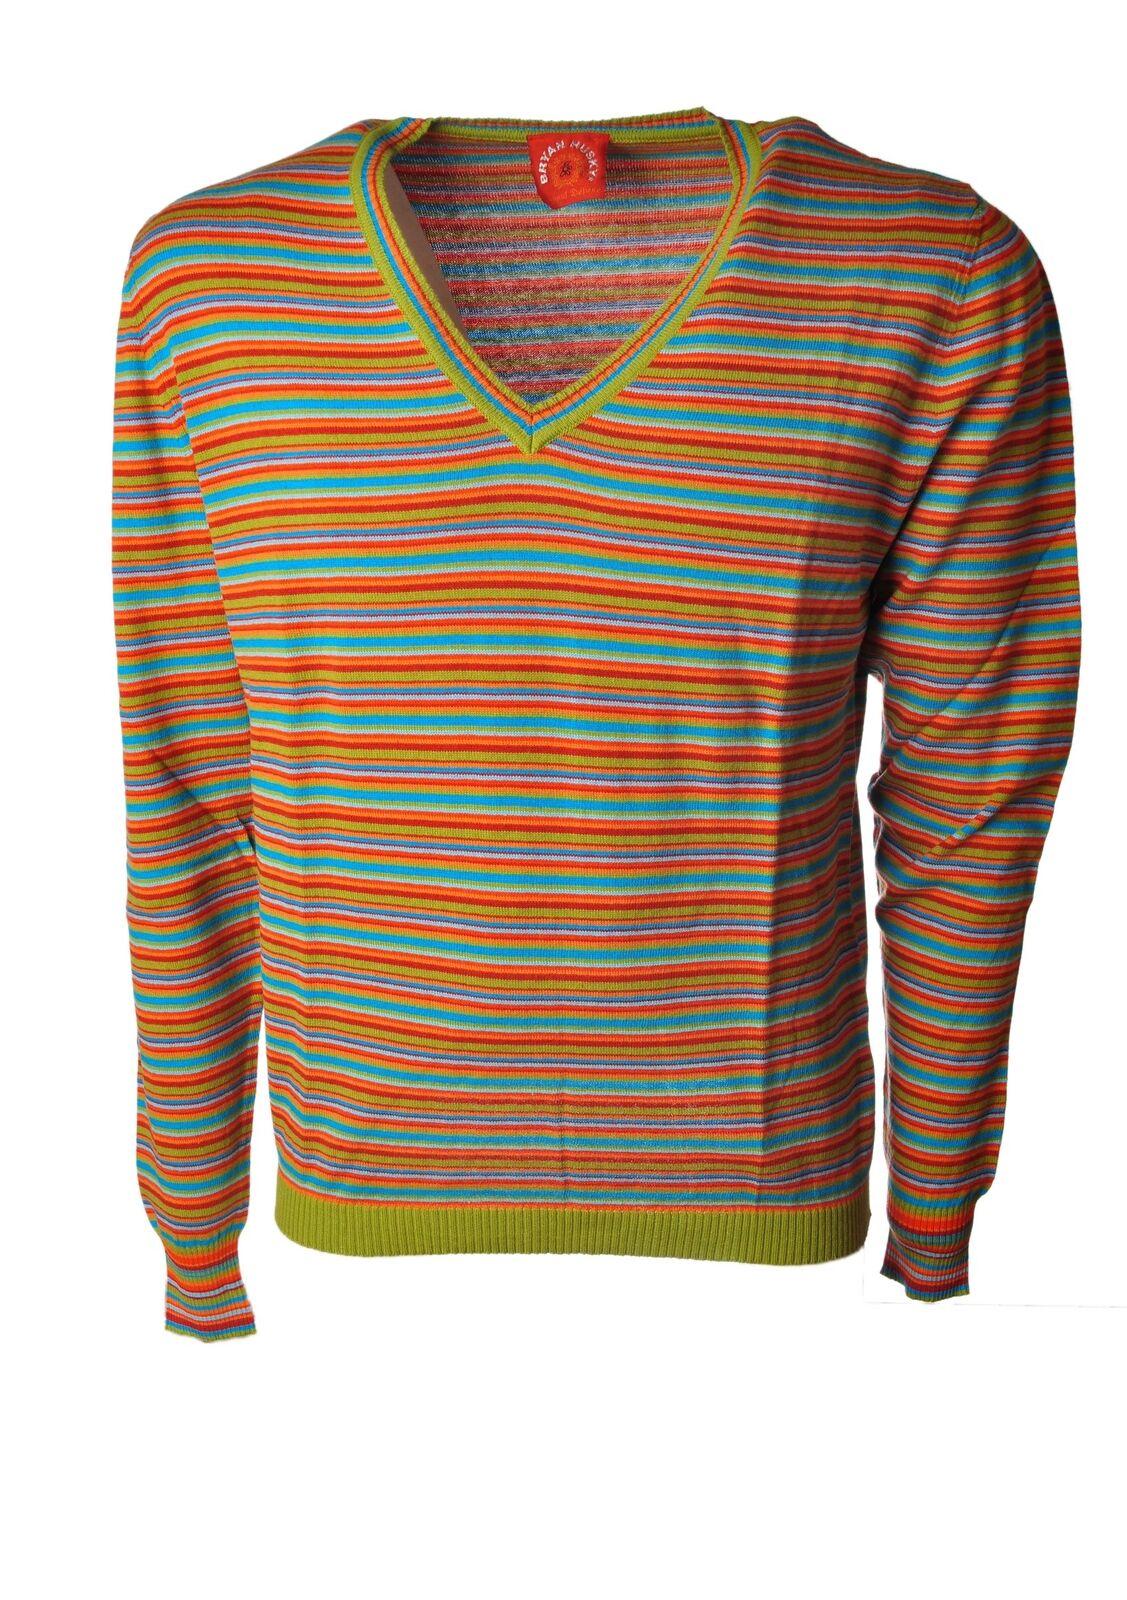 Bryan Husky  -  Sweaters - Male - Fantasy - 4512324A185014